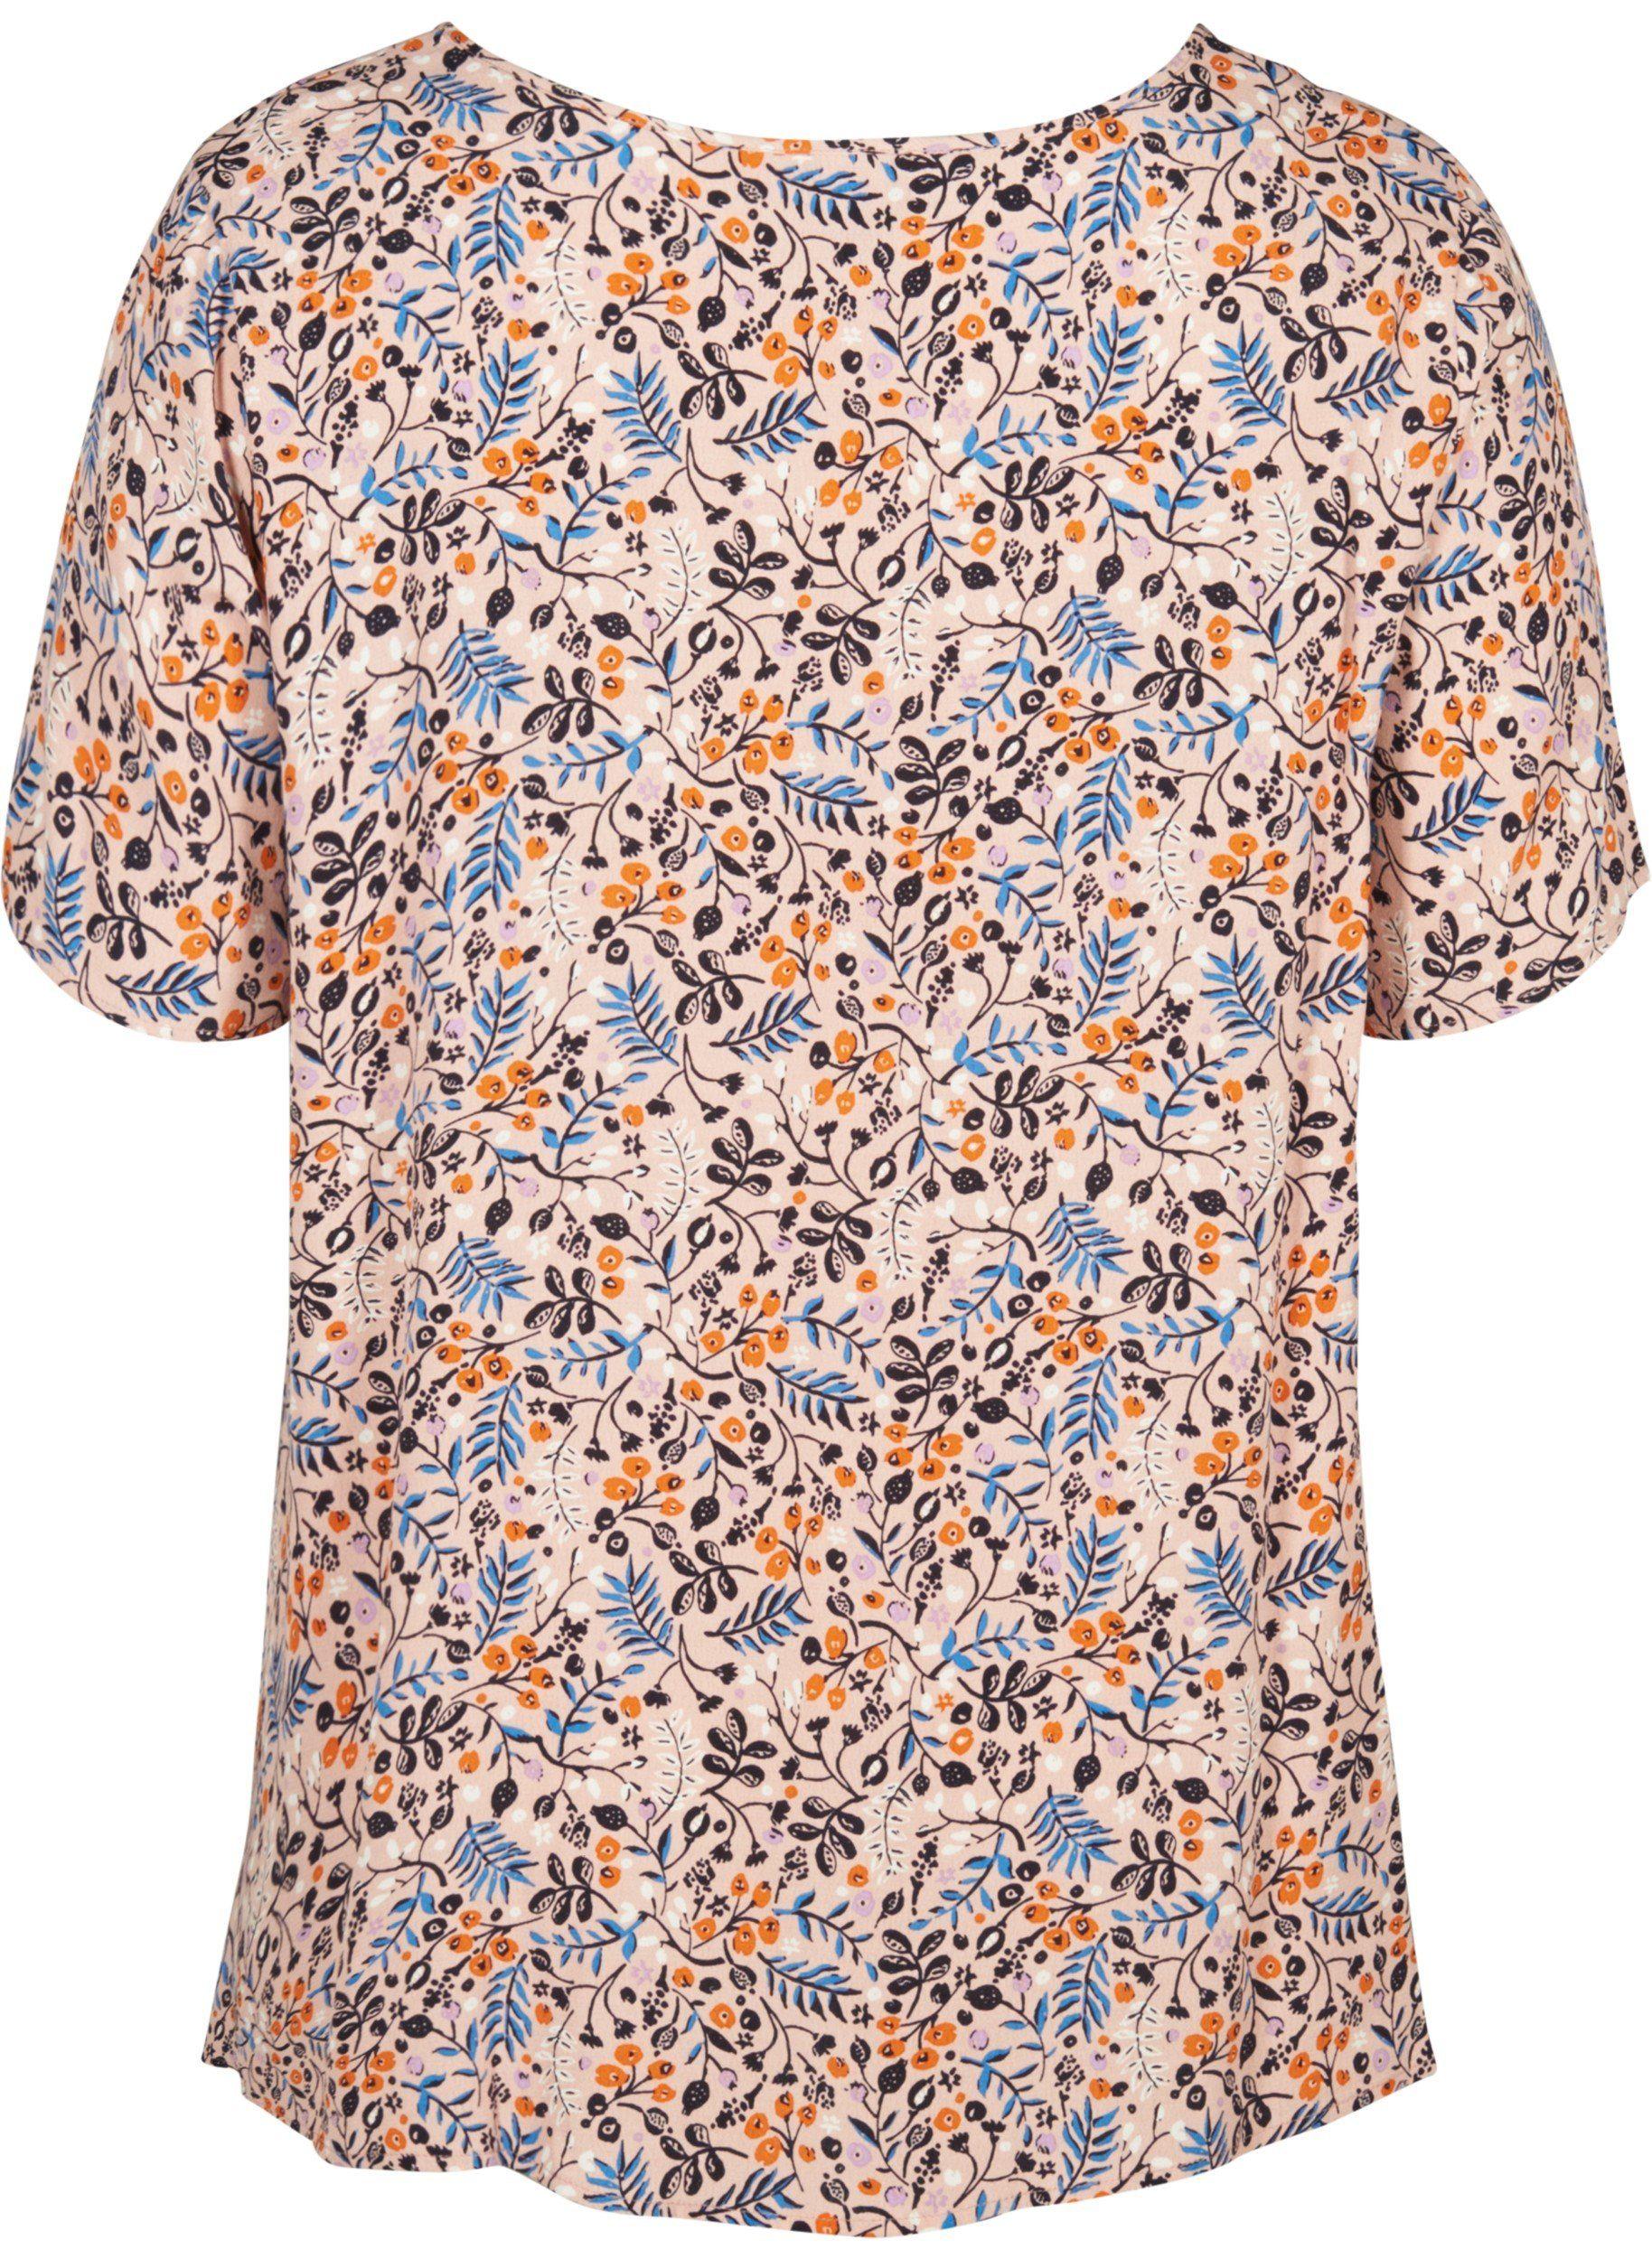 A Bluse Kurzarmbluse Online Kaufen Große Blusenshirt Damen Zizzi Kurzarm form Größen Blumenprint GVpSULqzM